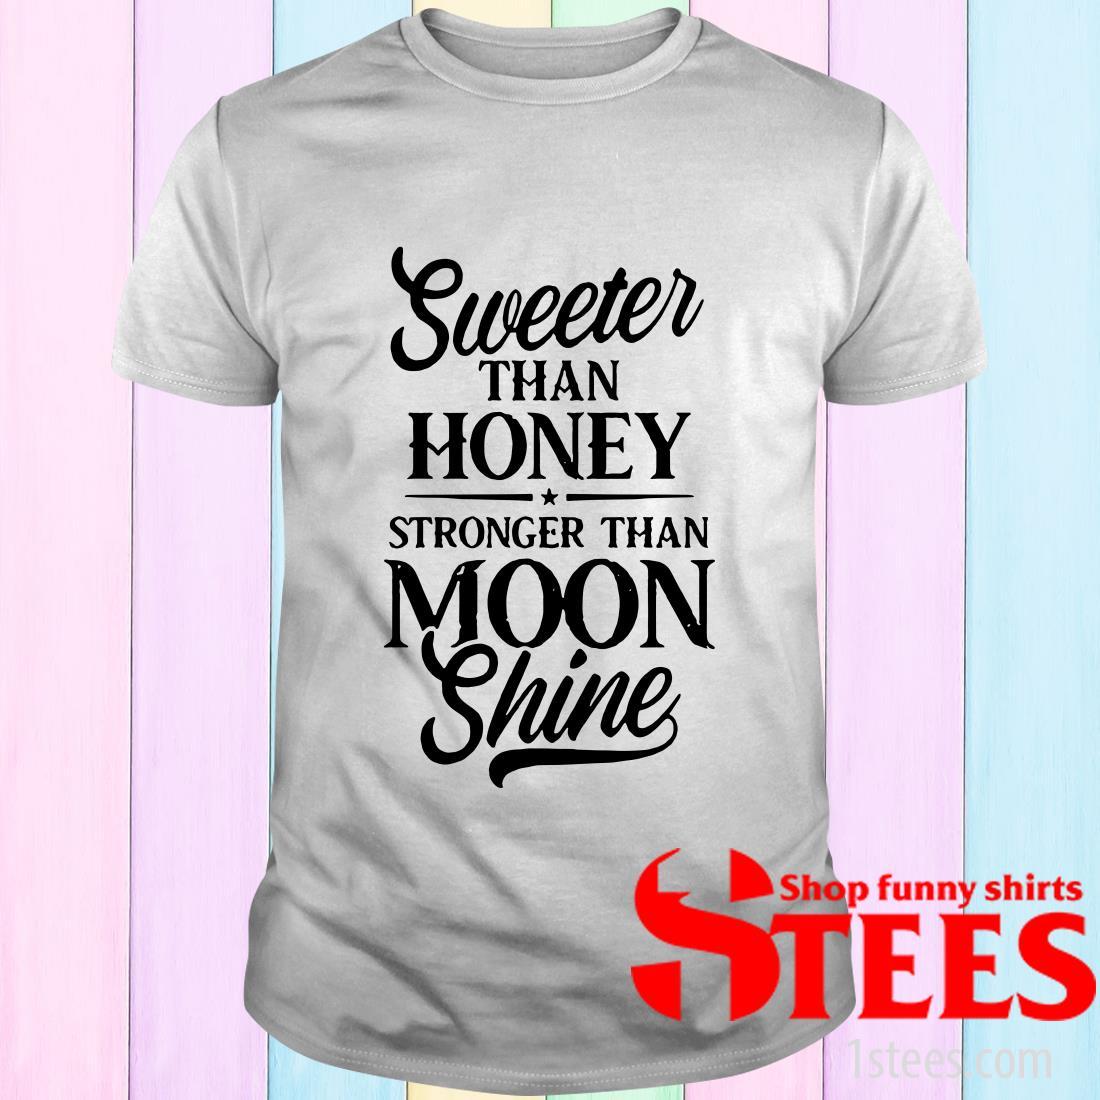 Sweeter Than Honey Stronger Than Moon Shine T-Shirt